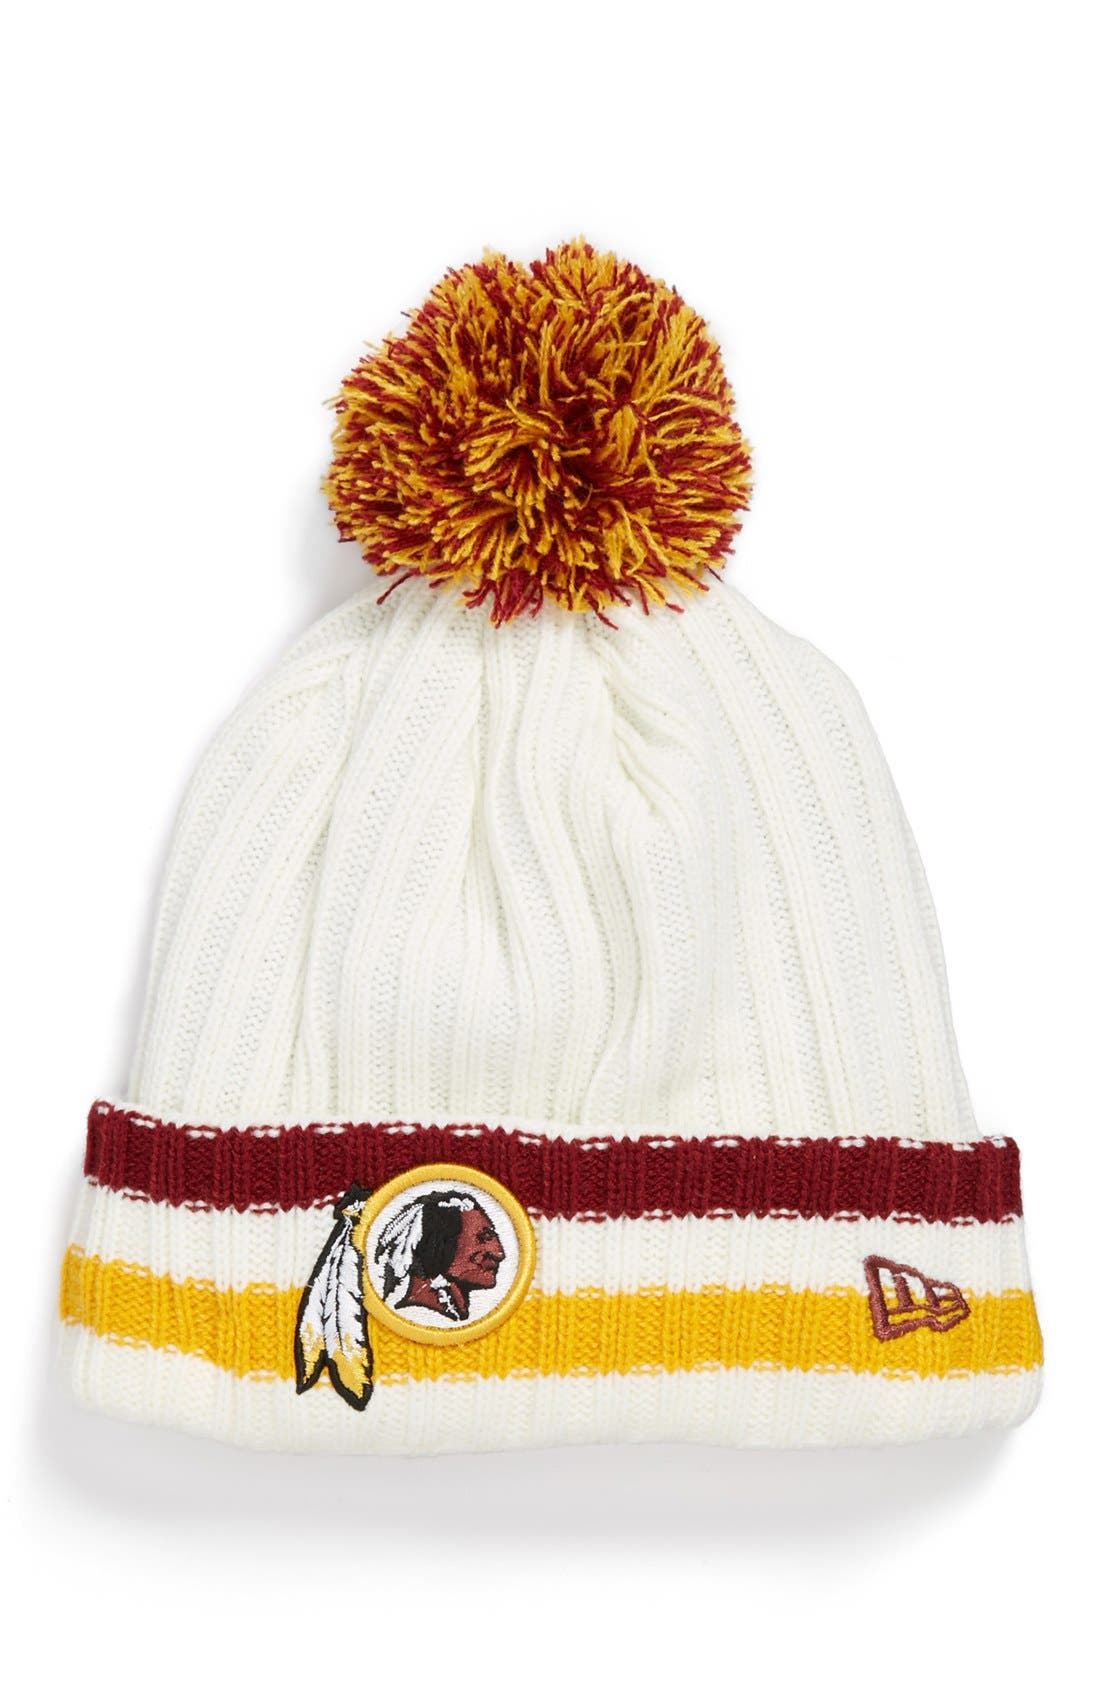 Alternate Image 1 Selected - New Era Cap 'Yesteryear - Washington Redskins' Knit Cap